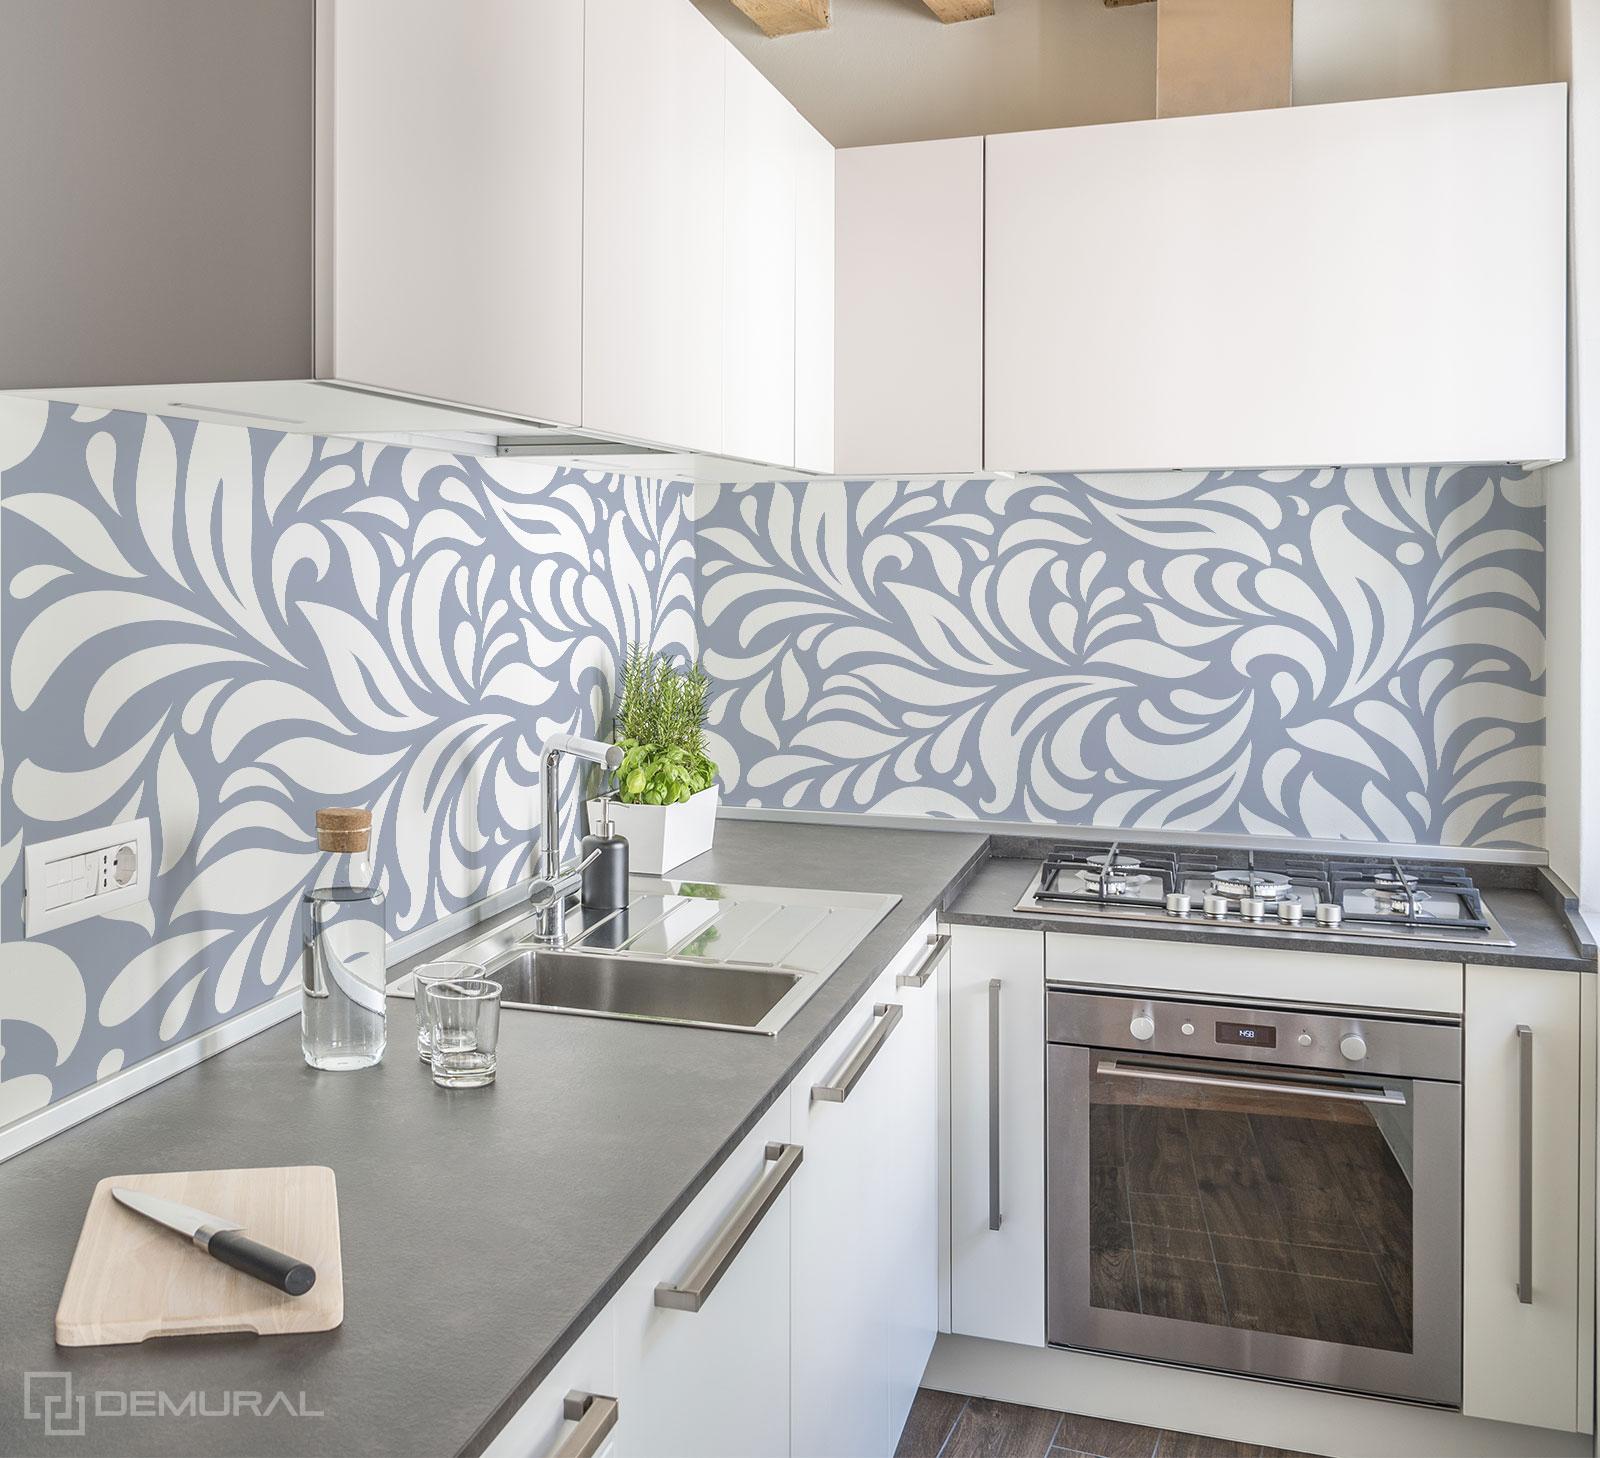 Fototapeta Odrobina naturalności - Fototapety do małej kuchni - Demural